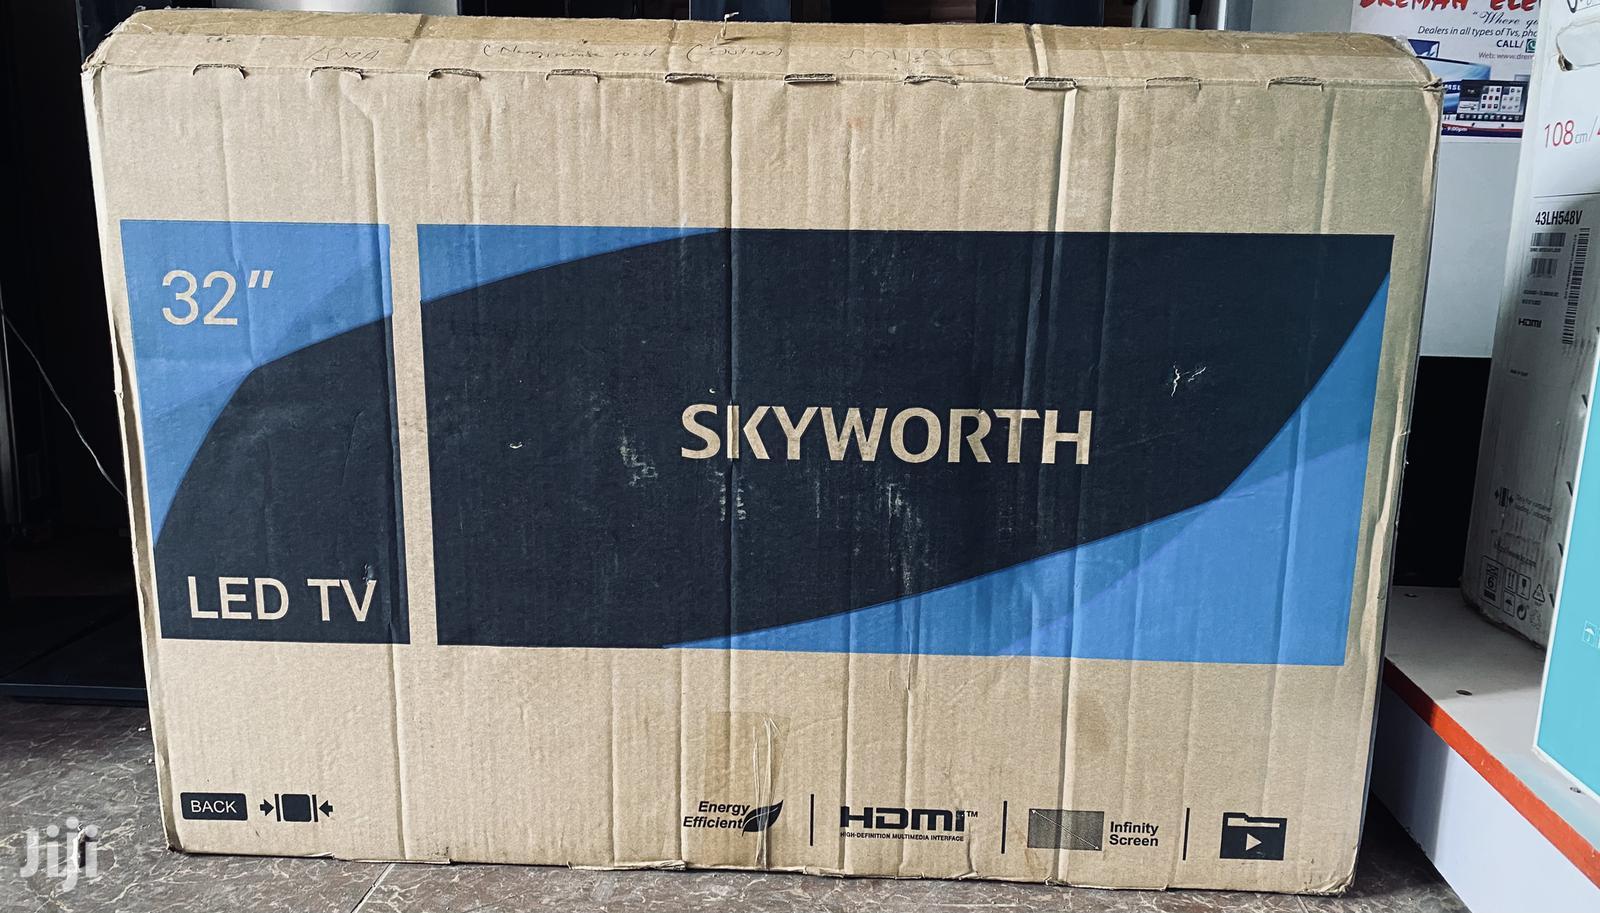 Skyworth LED Flat Screen TV 32 Inches